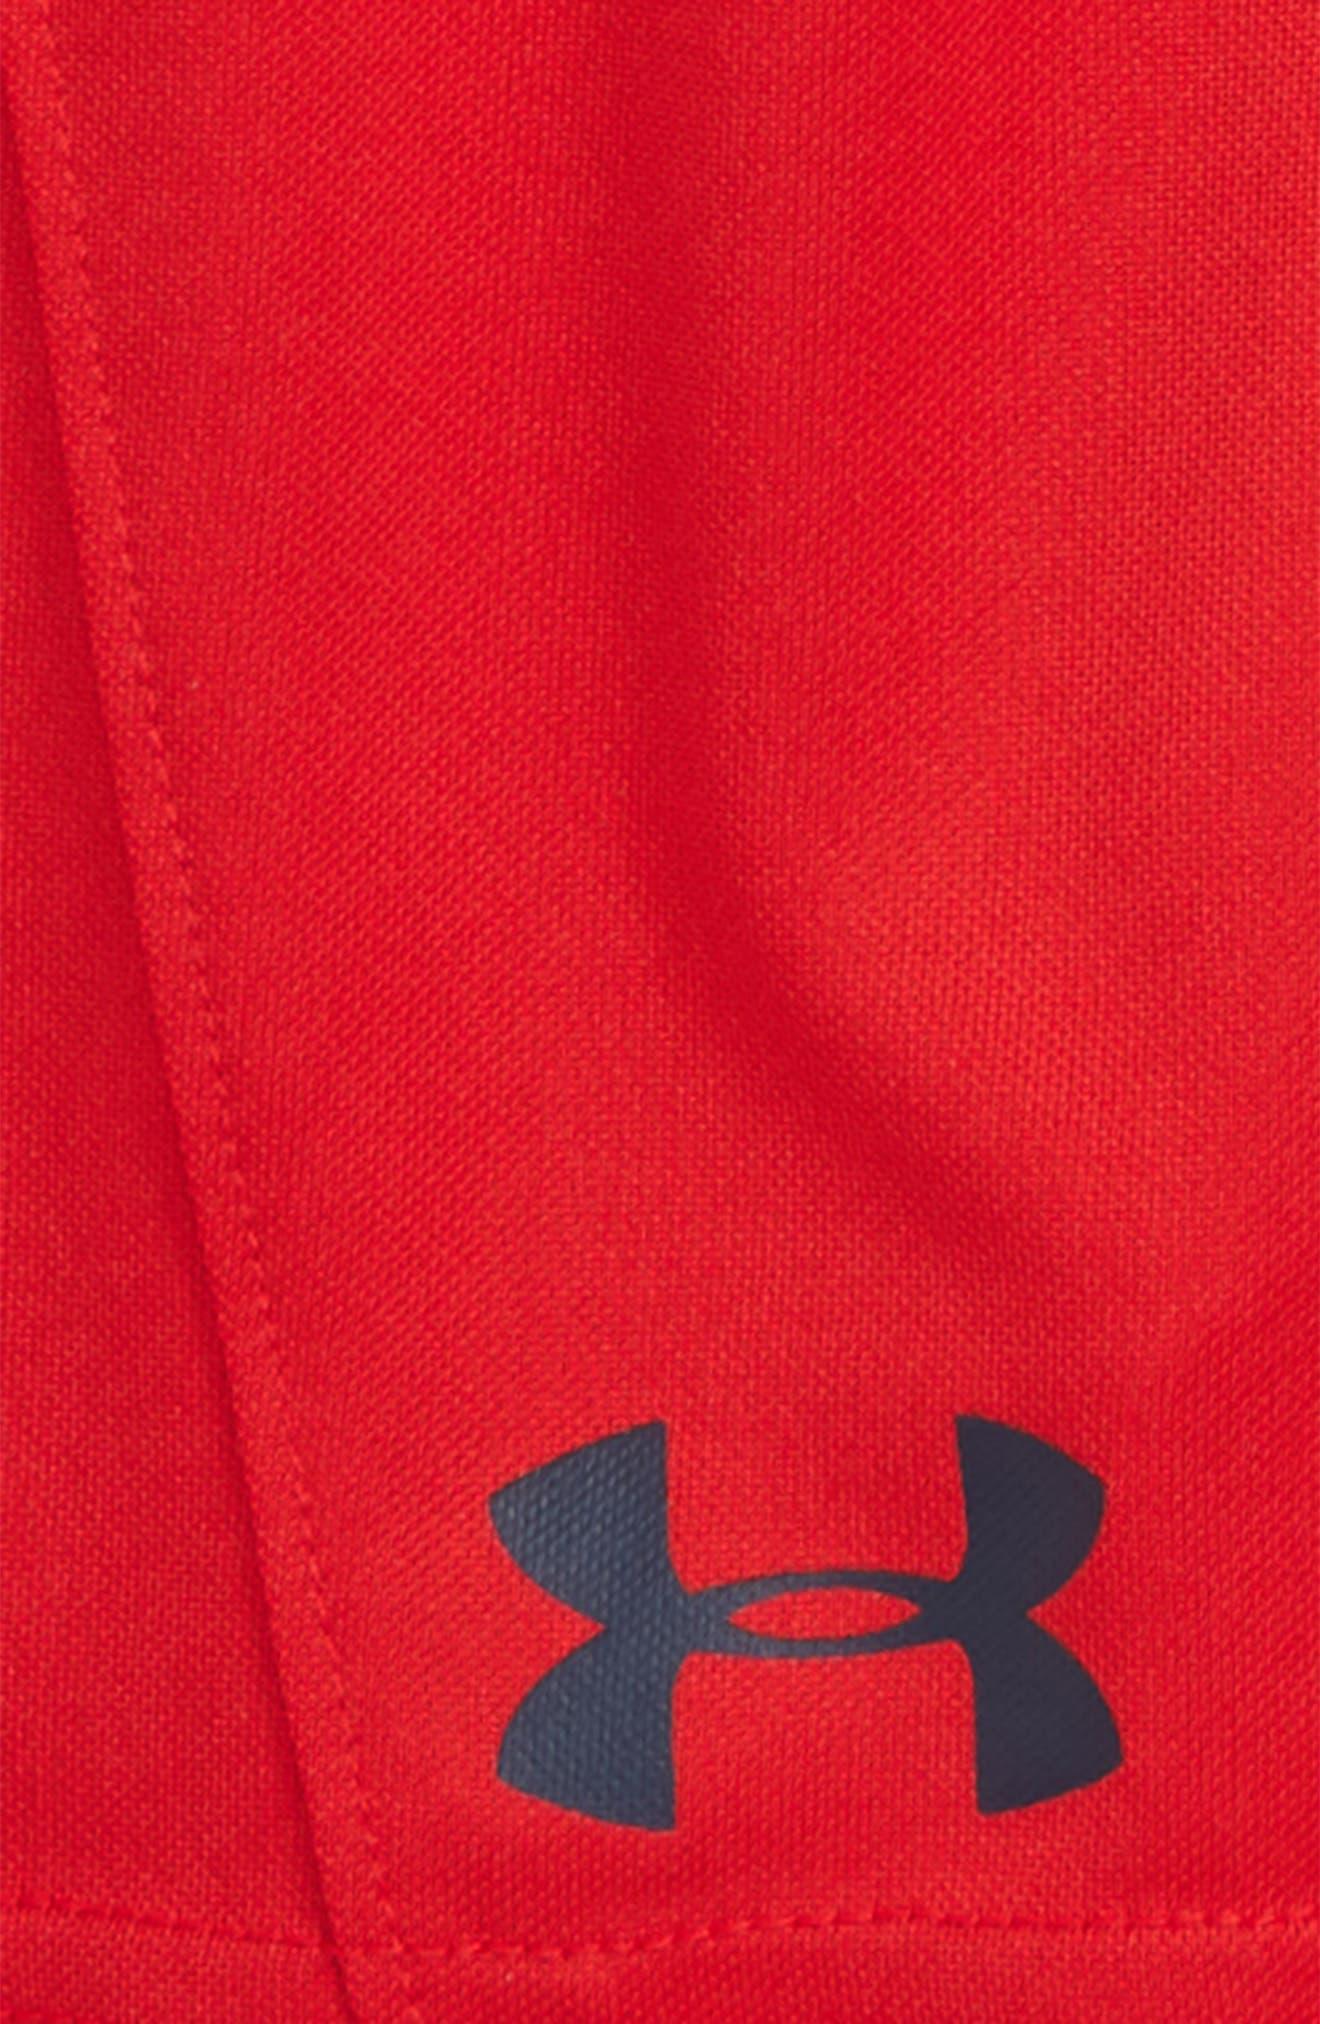 Kick Off HeatGear<sup>®</sup> Shorts,                             Alternate thumbnail 4, color,